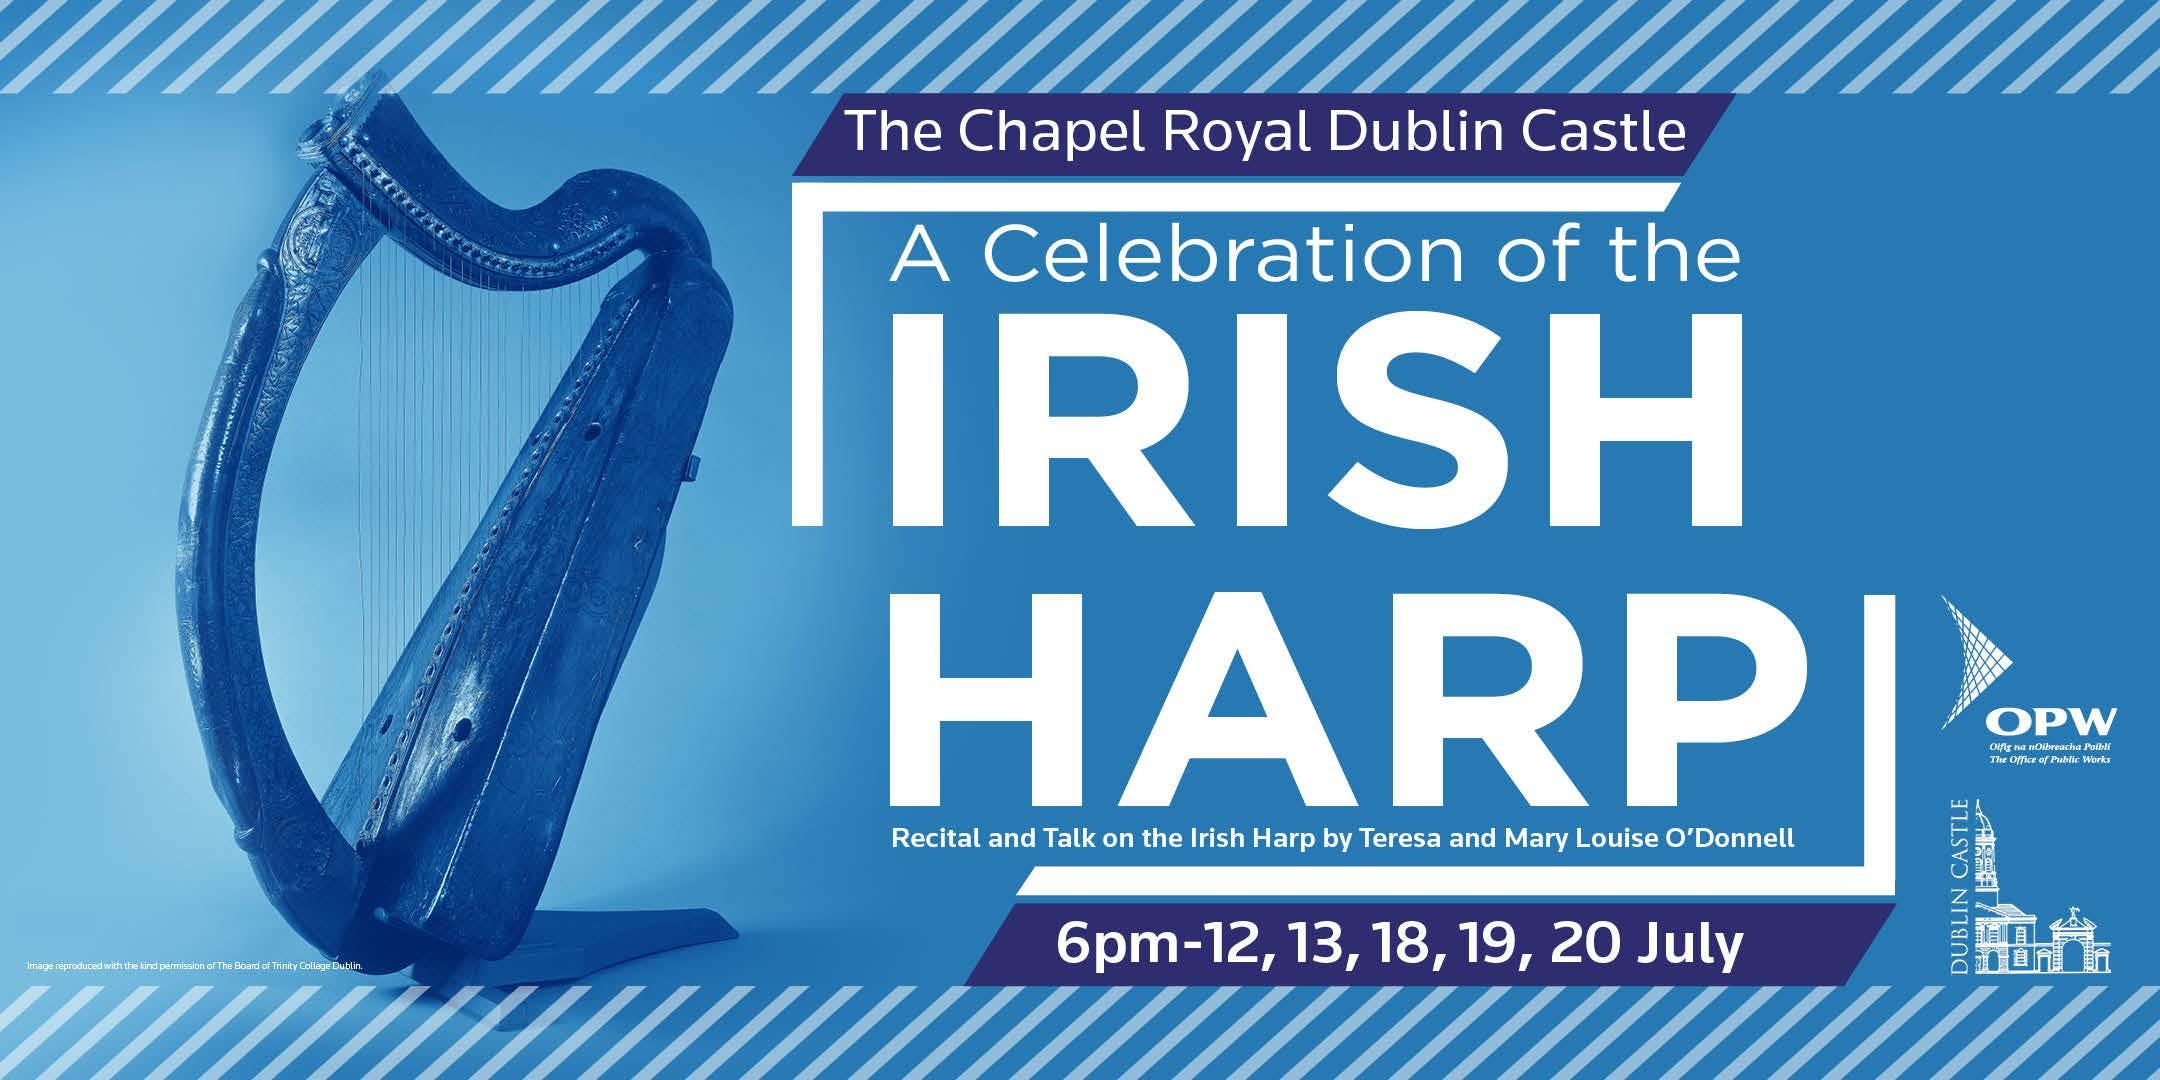 A Celebration of the Irish Harp